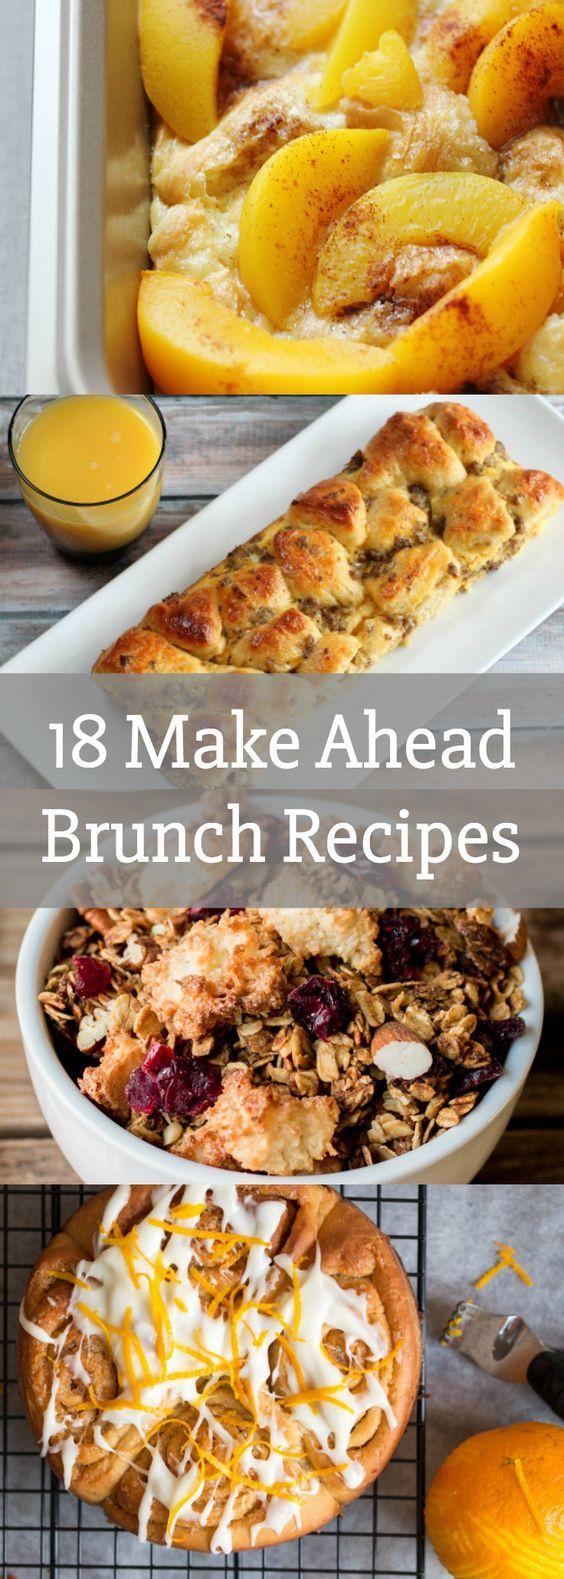 18 Make Ahead Brunch Recipes- Breakfast, brunch ideas, party ideas, Easter, recipes, casseroles, oatmeal, cinnamon rolls, sweets, food, bread, fruit, eggs, bacon, quiche via @LovePastaBlog